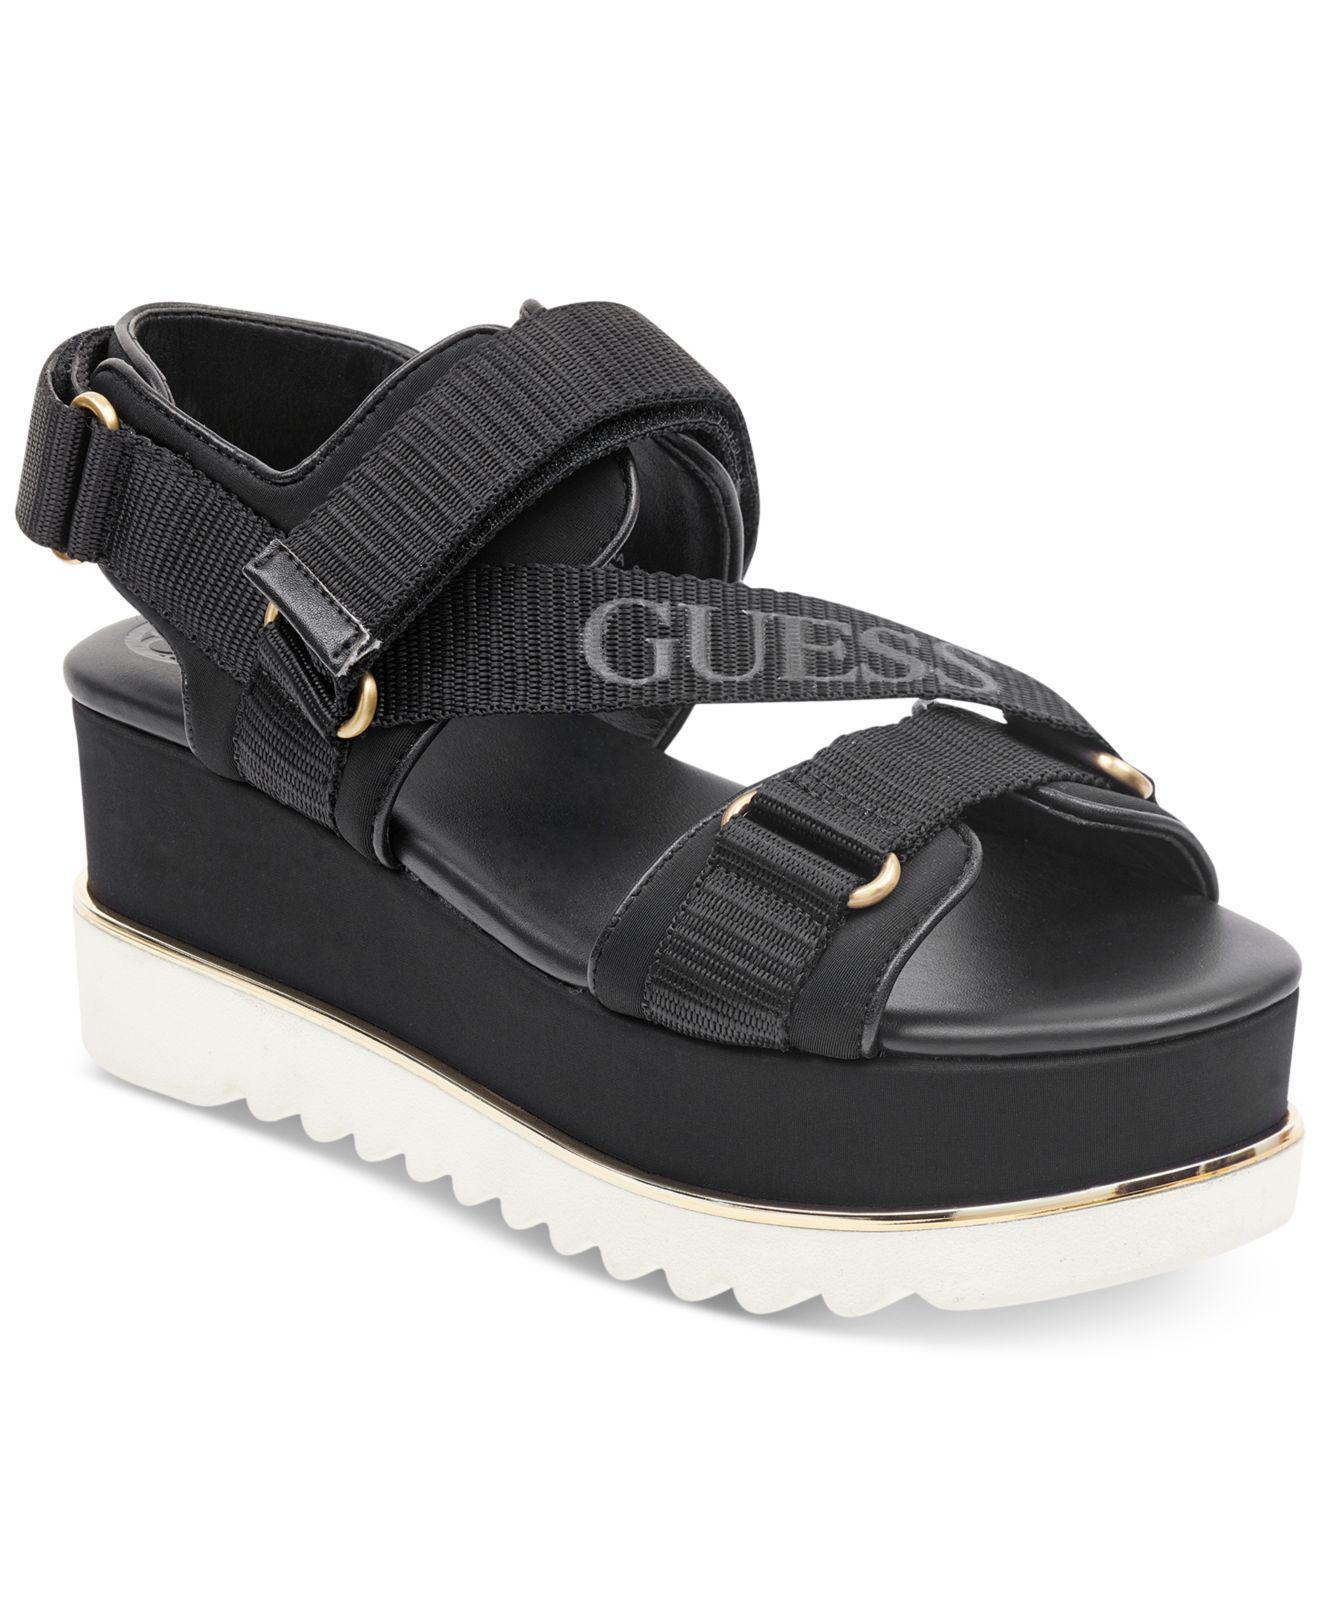 Guess Women's Laureta Flatform Logo Sport Sandals Women's Shoes Gb0ig2R